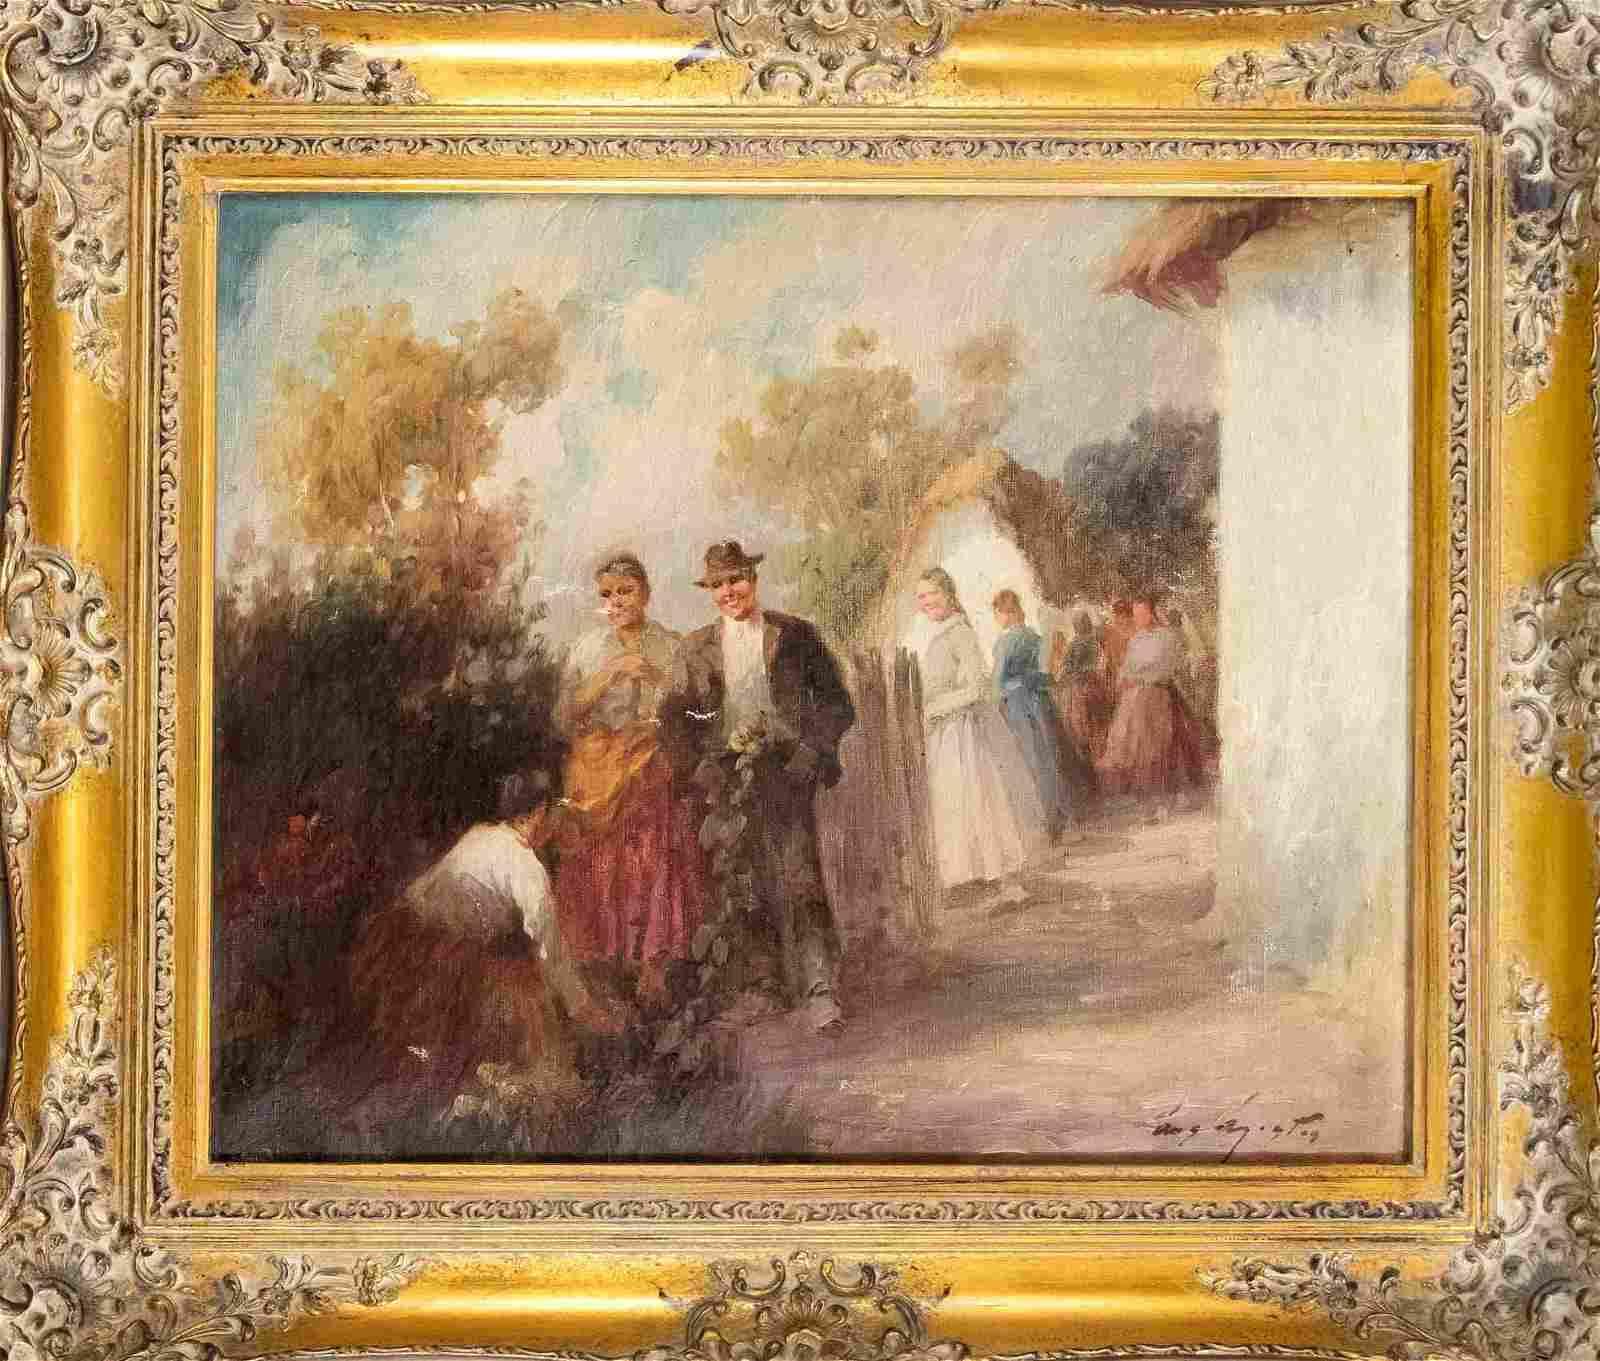 Agoston, Hungarian painte